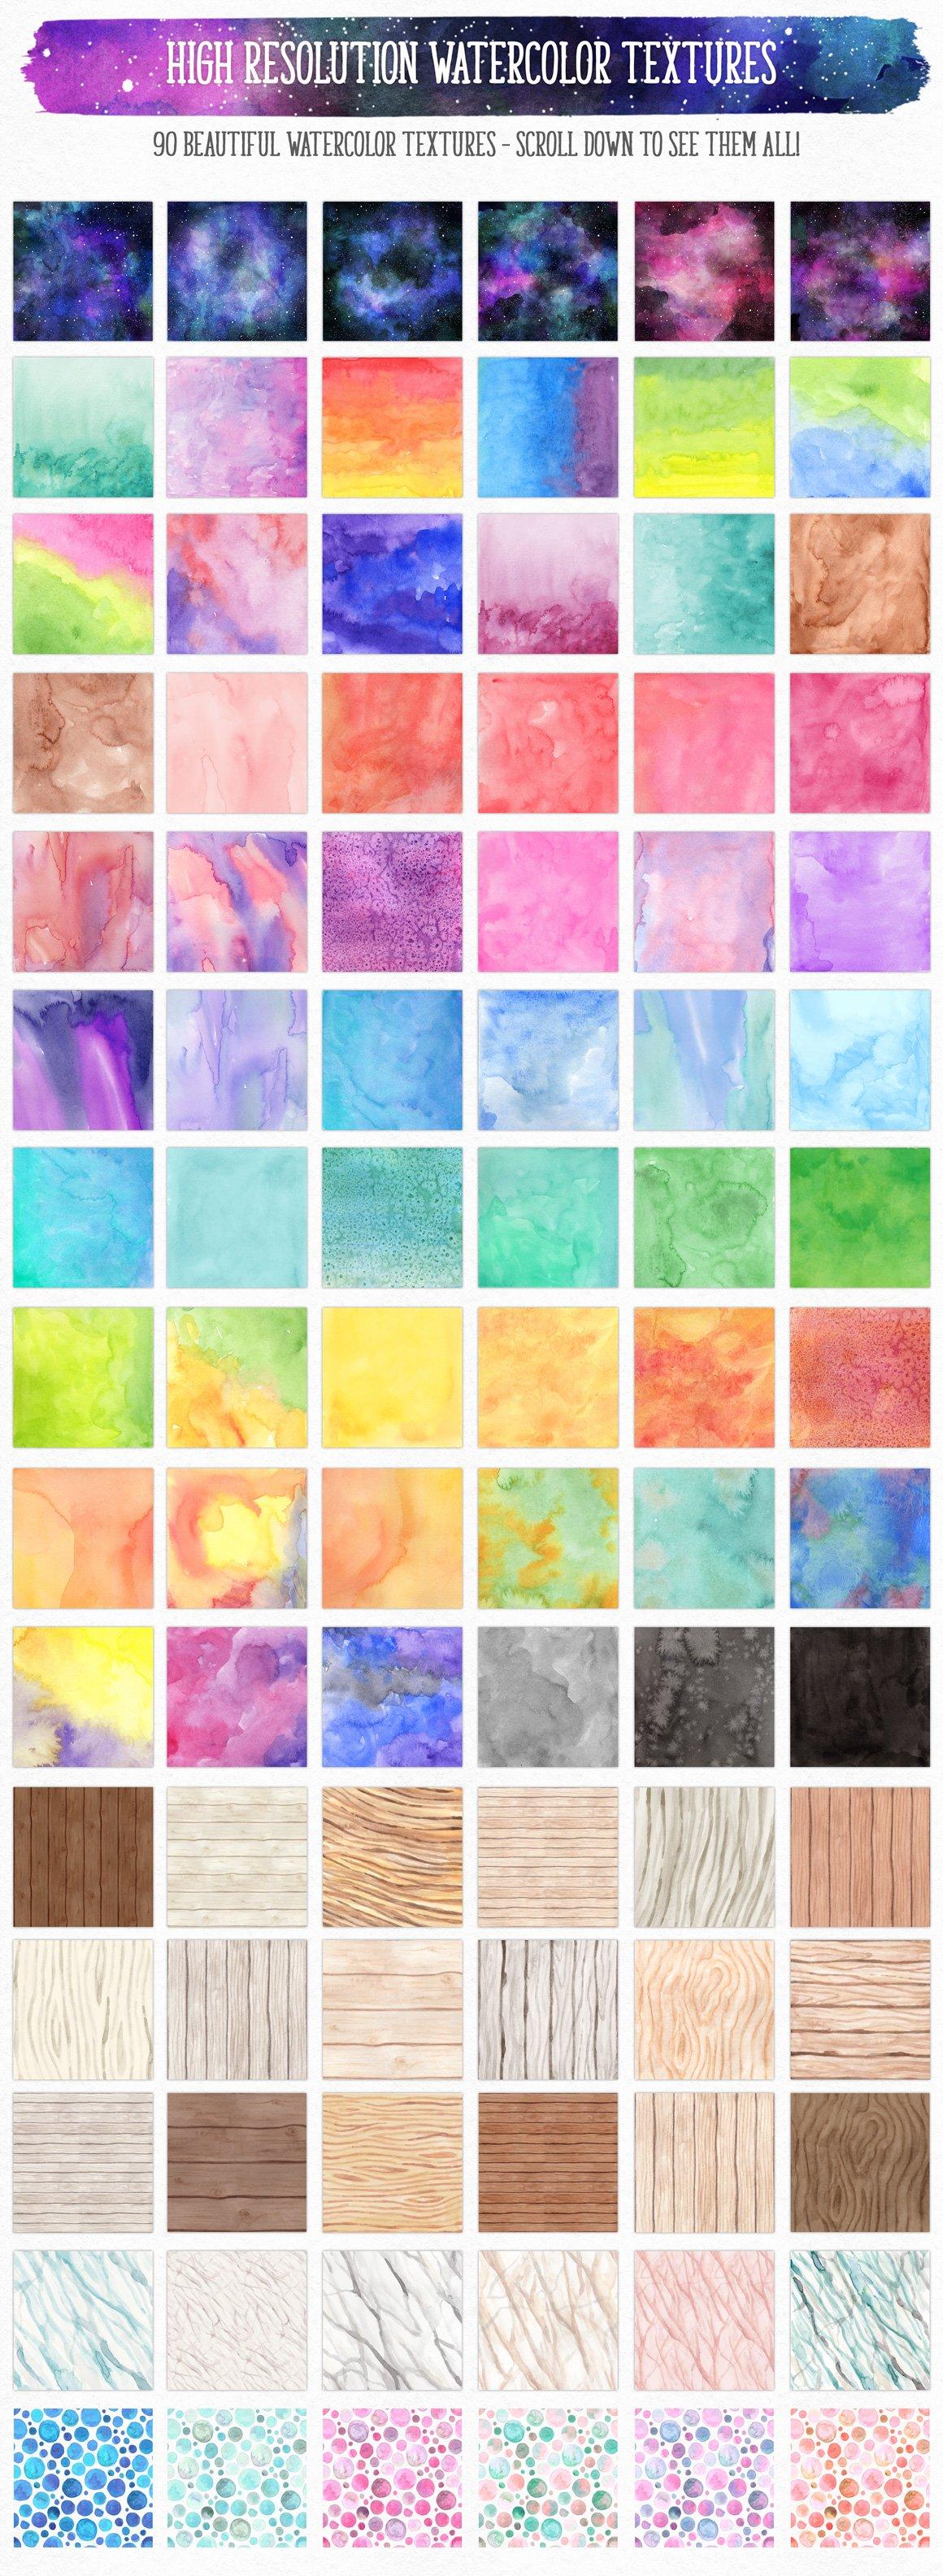 700多个木材大理石空间水彩纹理工具包 New Watercolor Texture Toolkit插图(12)